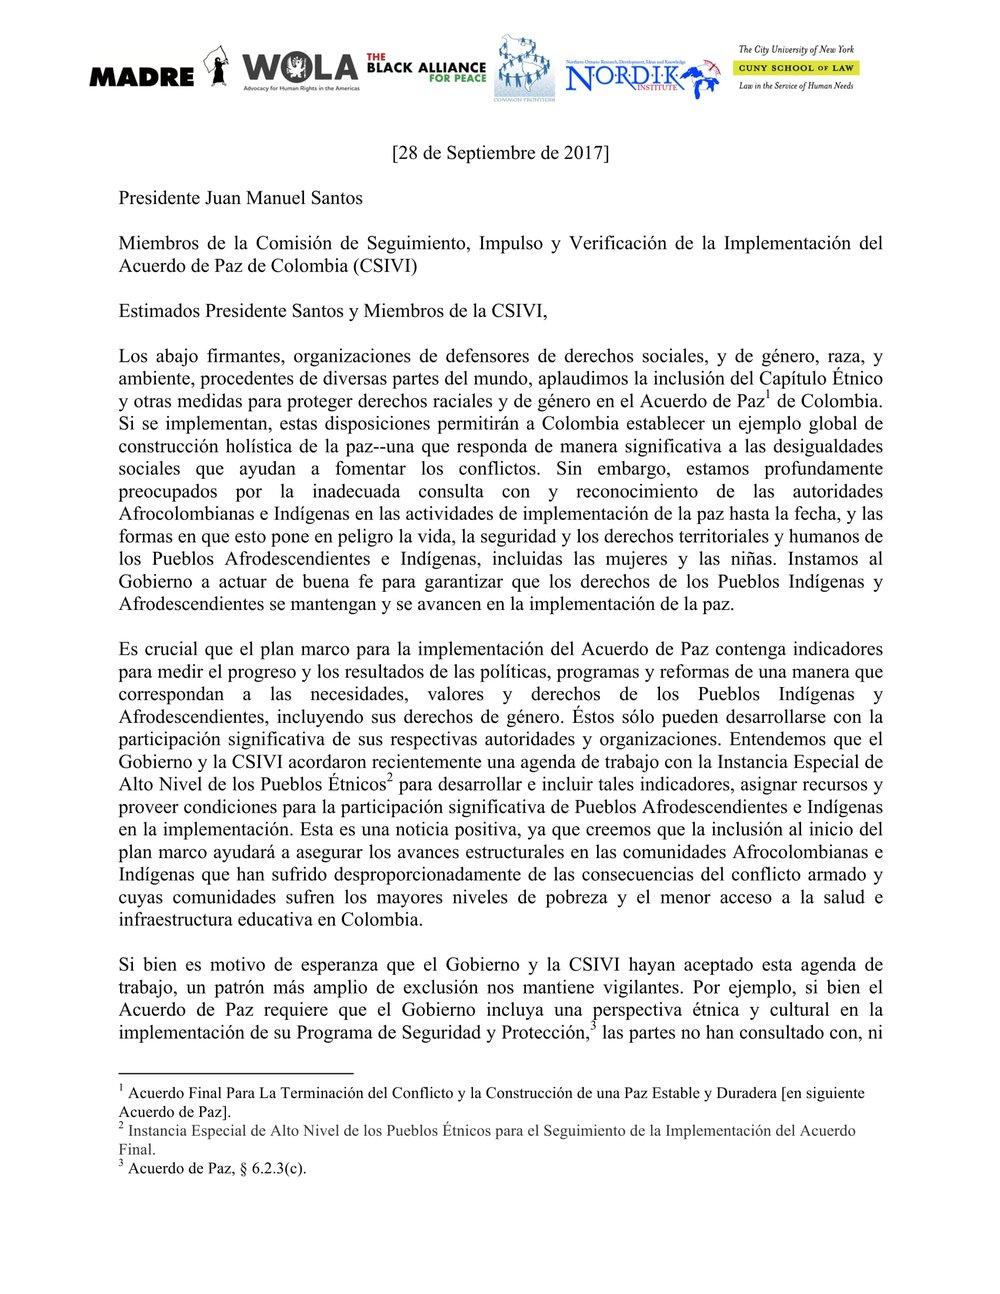 CartaSantosCsiviEspFINAL-1.jpg